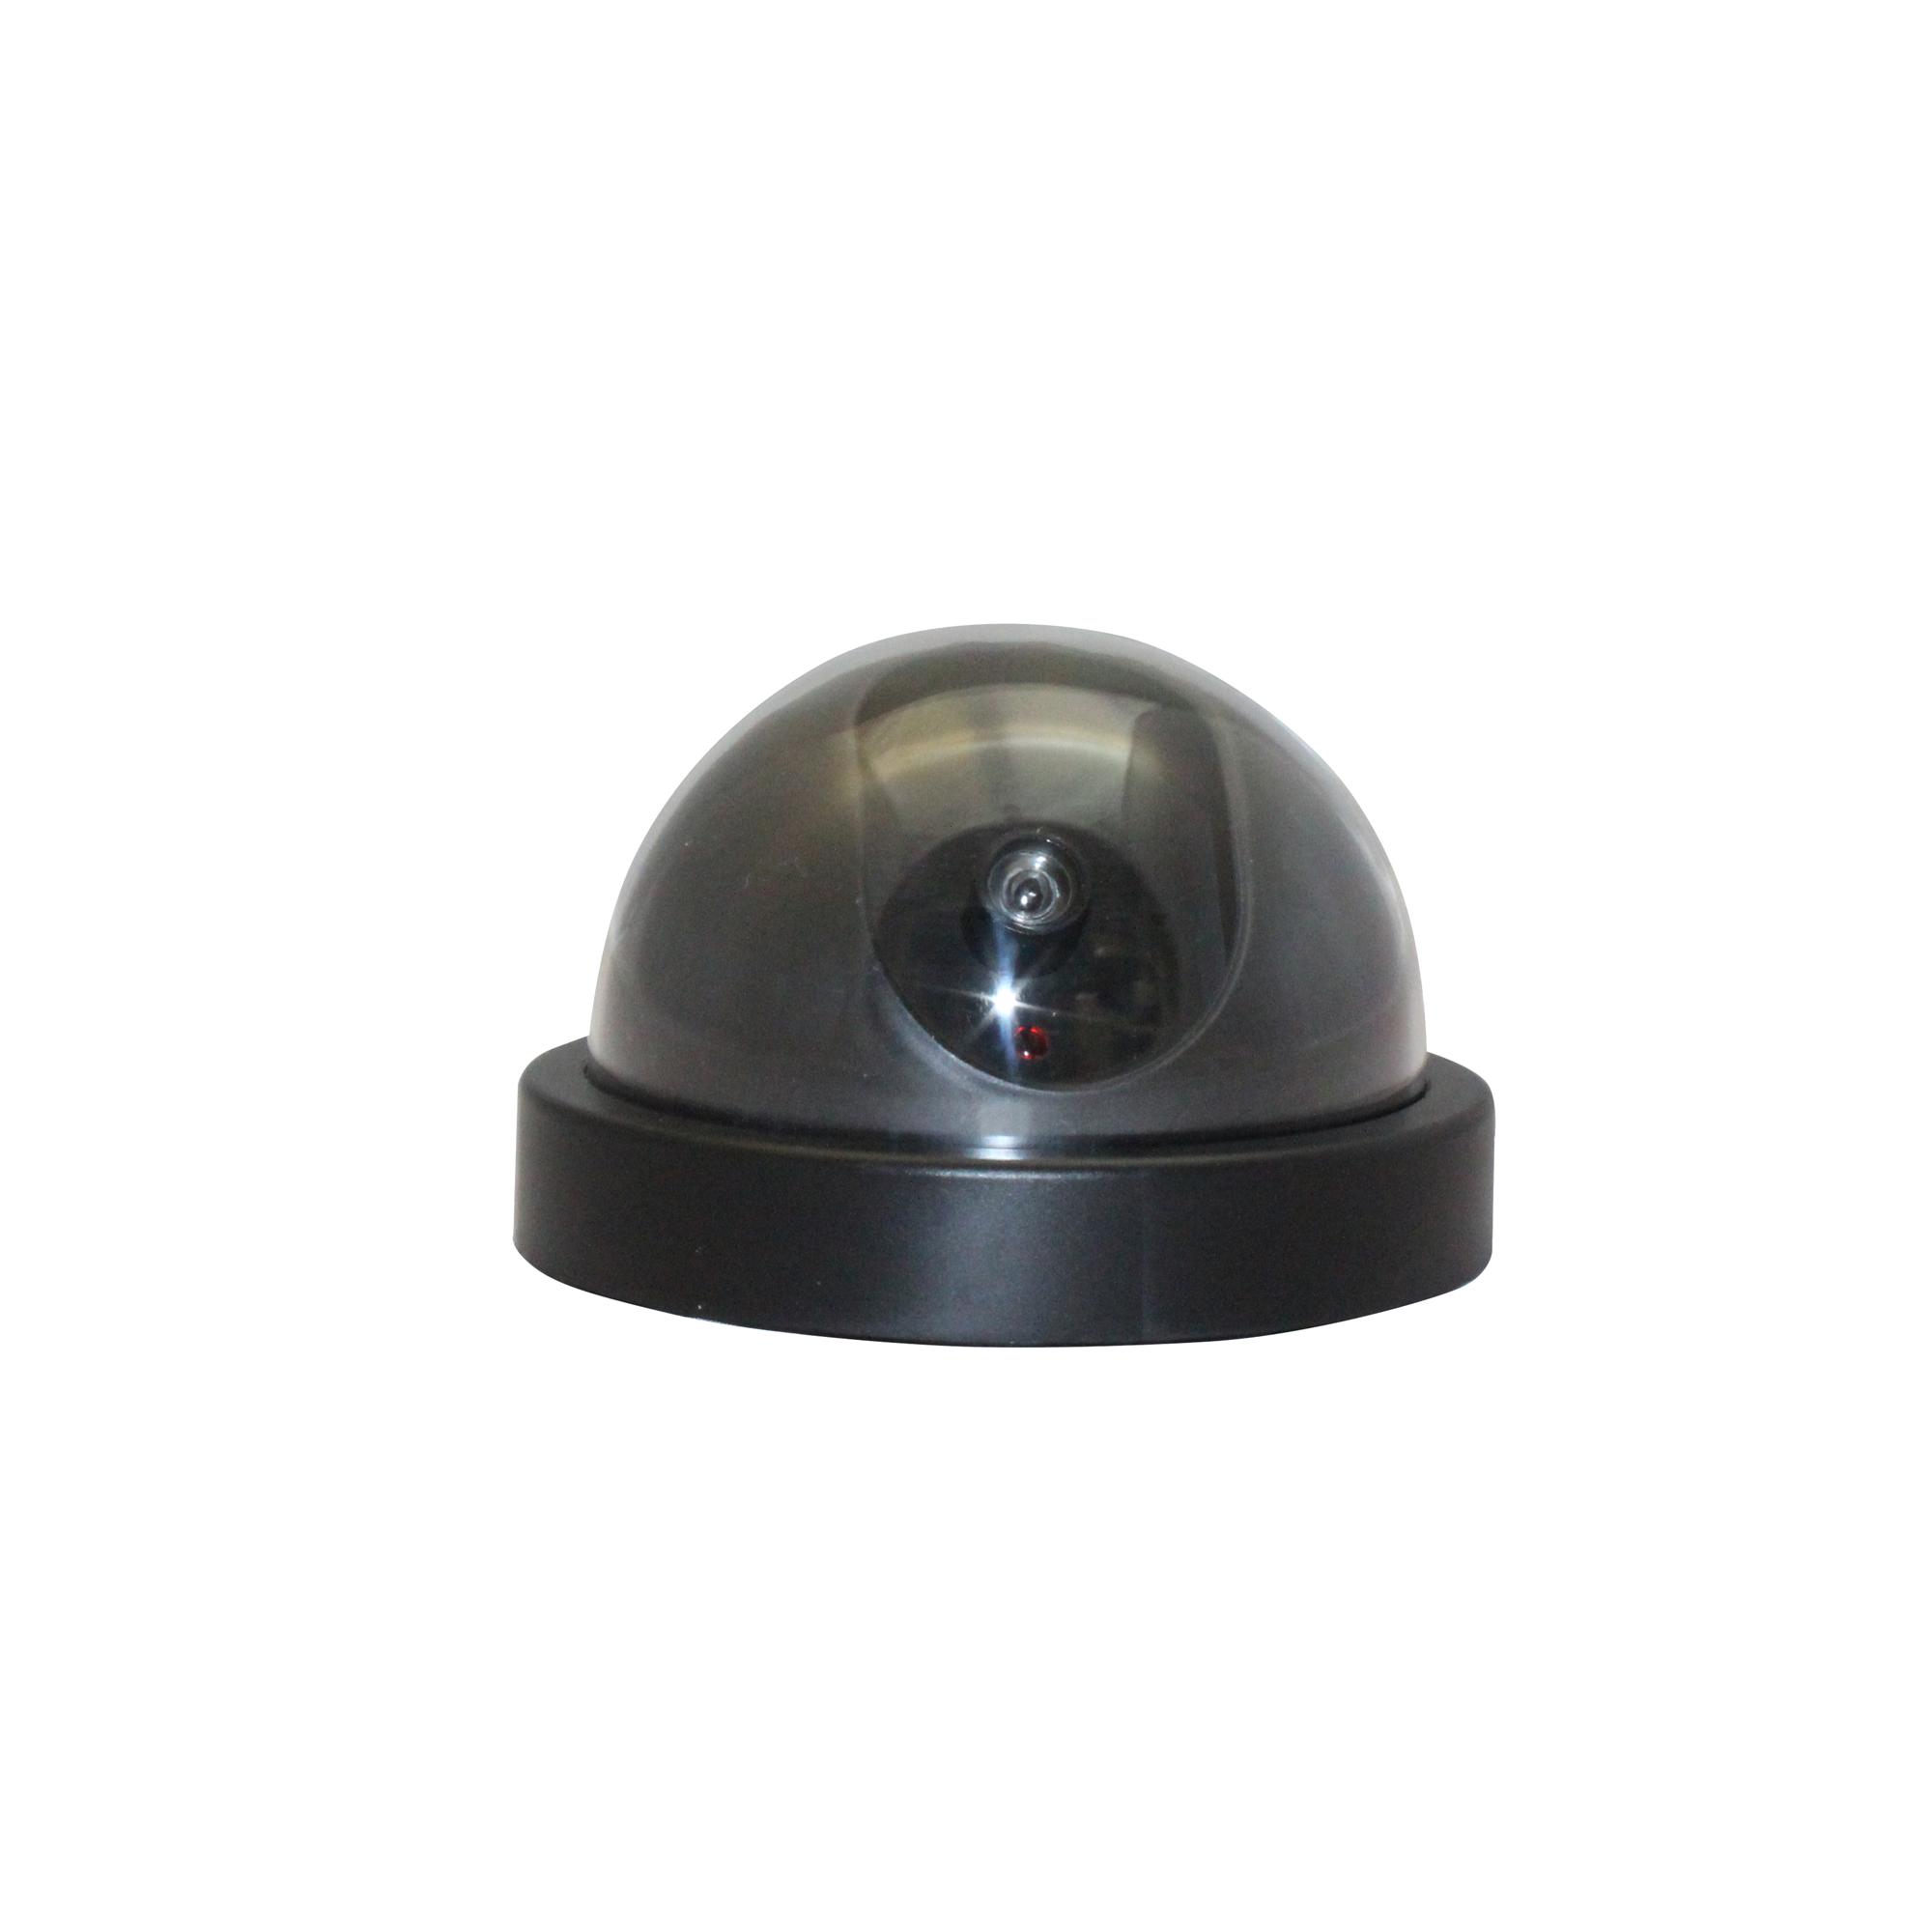 Муляж камеры видеонаблюдения SpeedRoll 1006